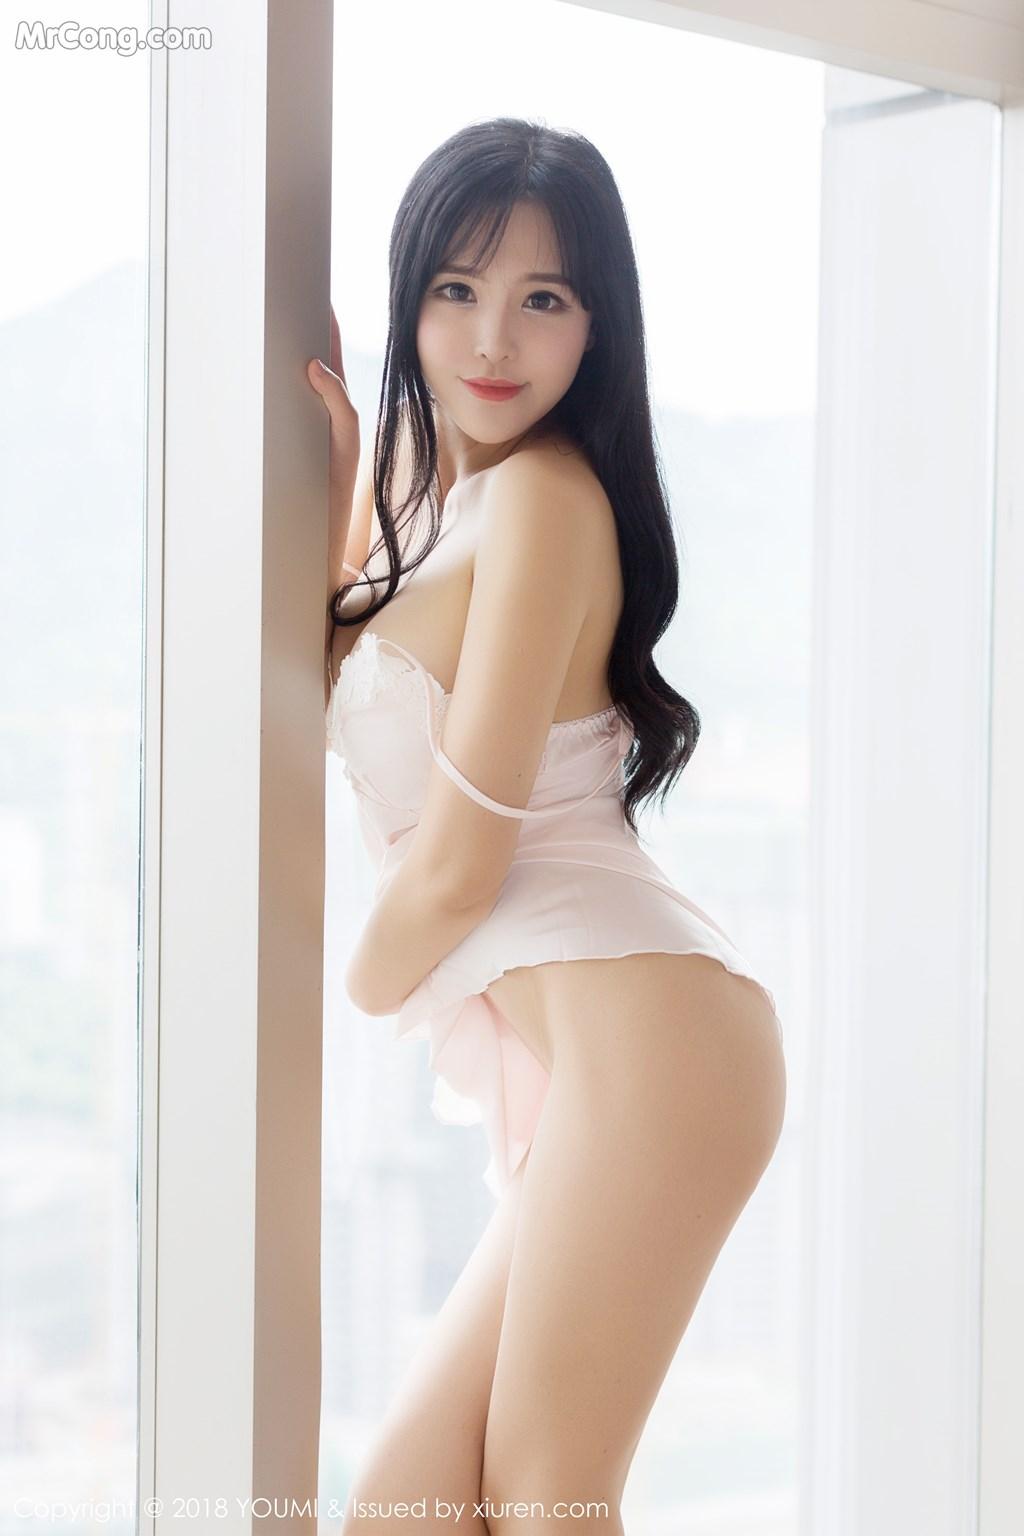 YouMi Vol.117: Model Liu Yu Er (刘 钰 儿) (39 photos)